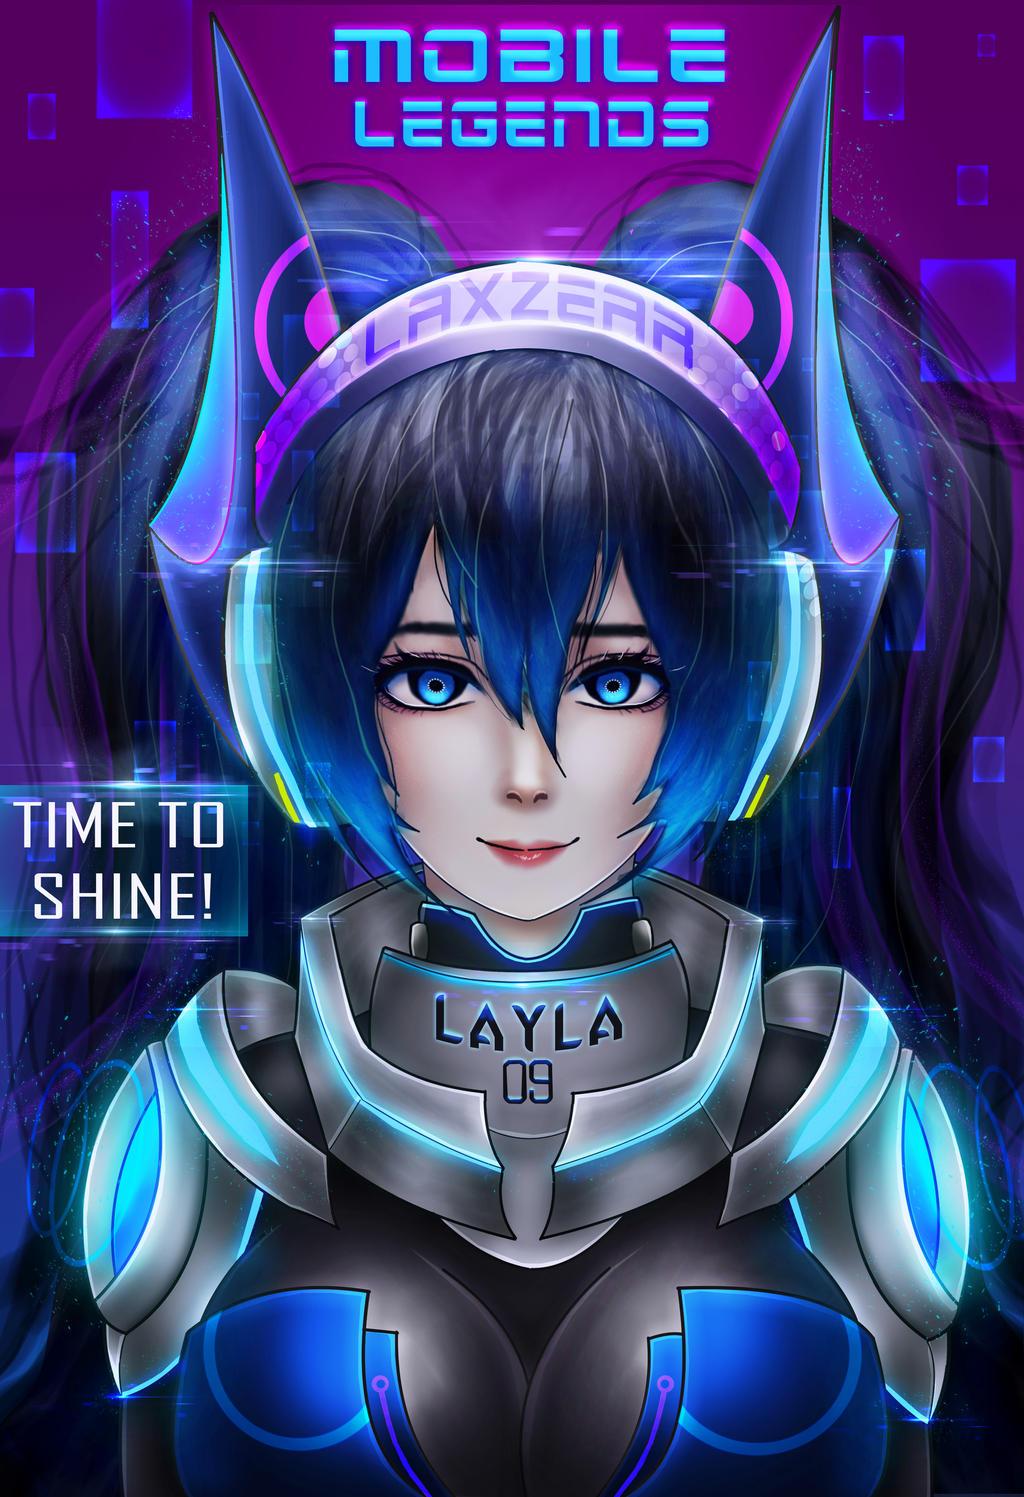 Layla Mobile Legends By Laxzear On DeviantArt Mobile